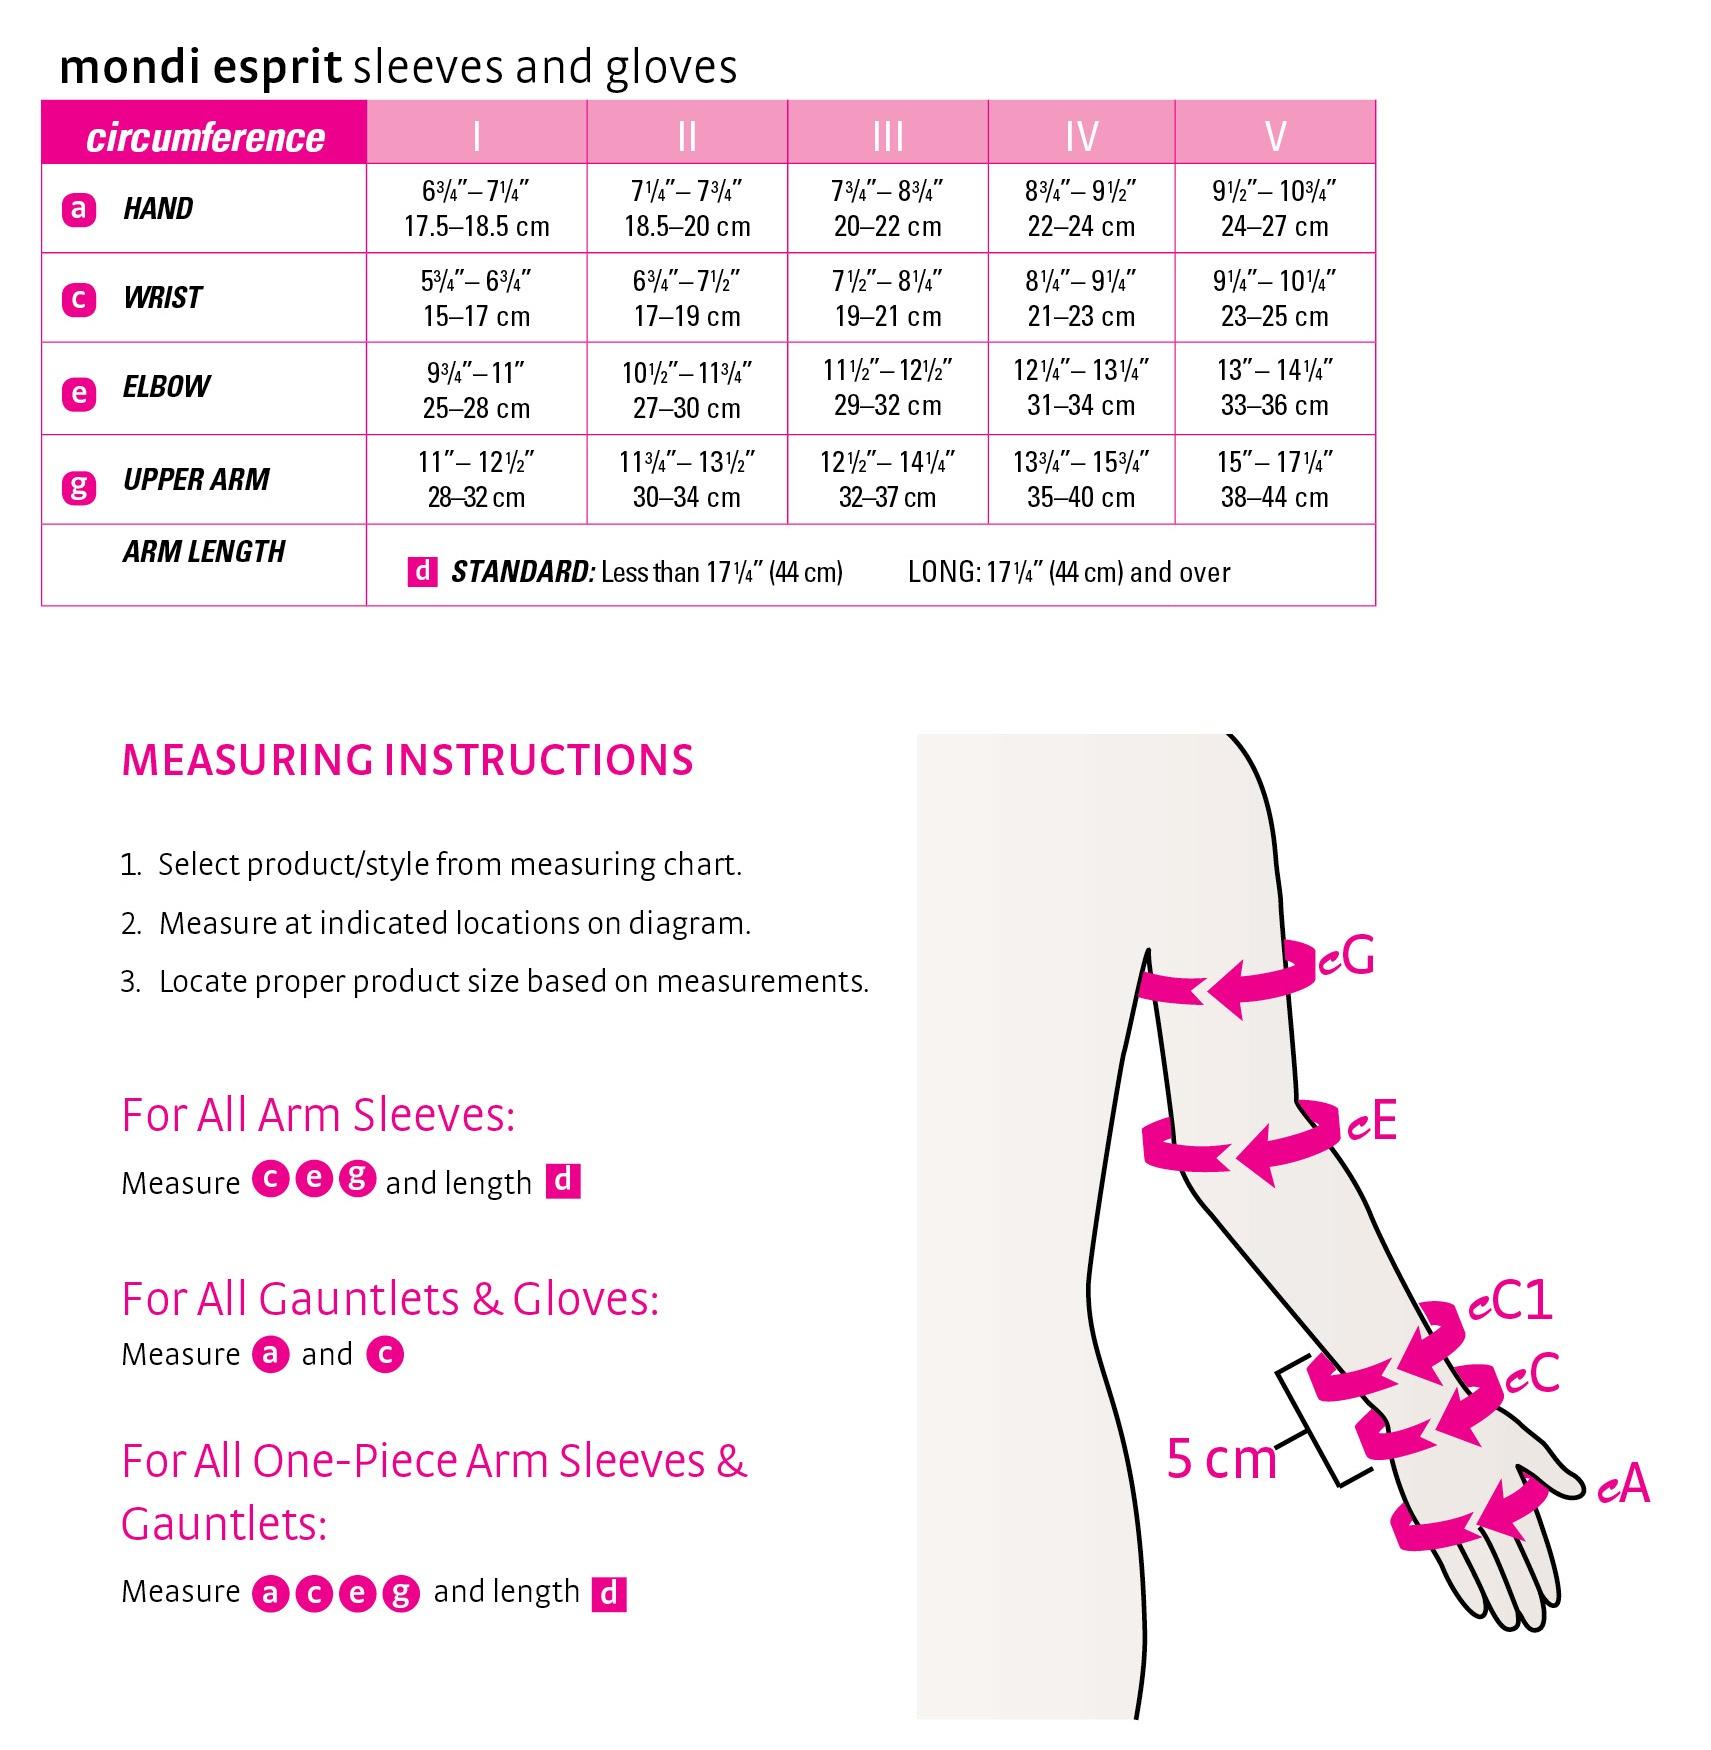 medi-esprit-size-chart-2.jpg